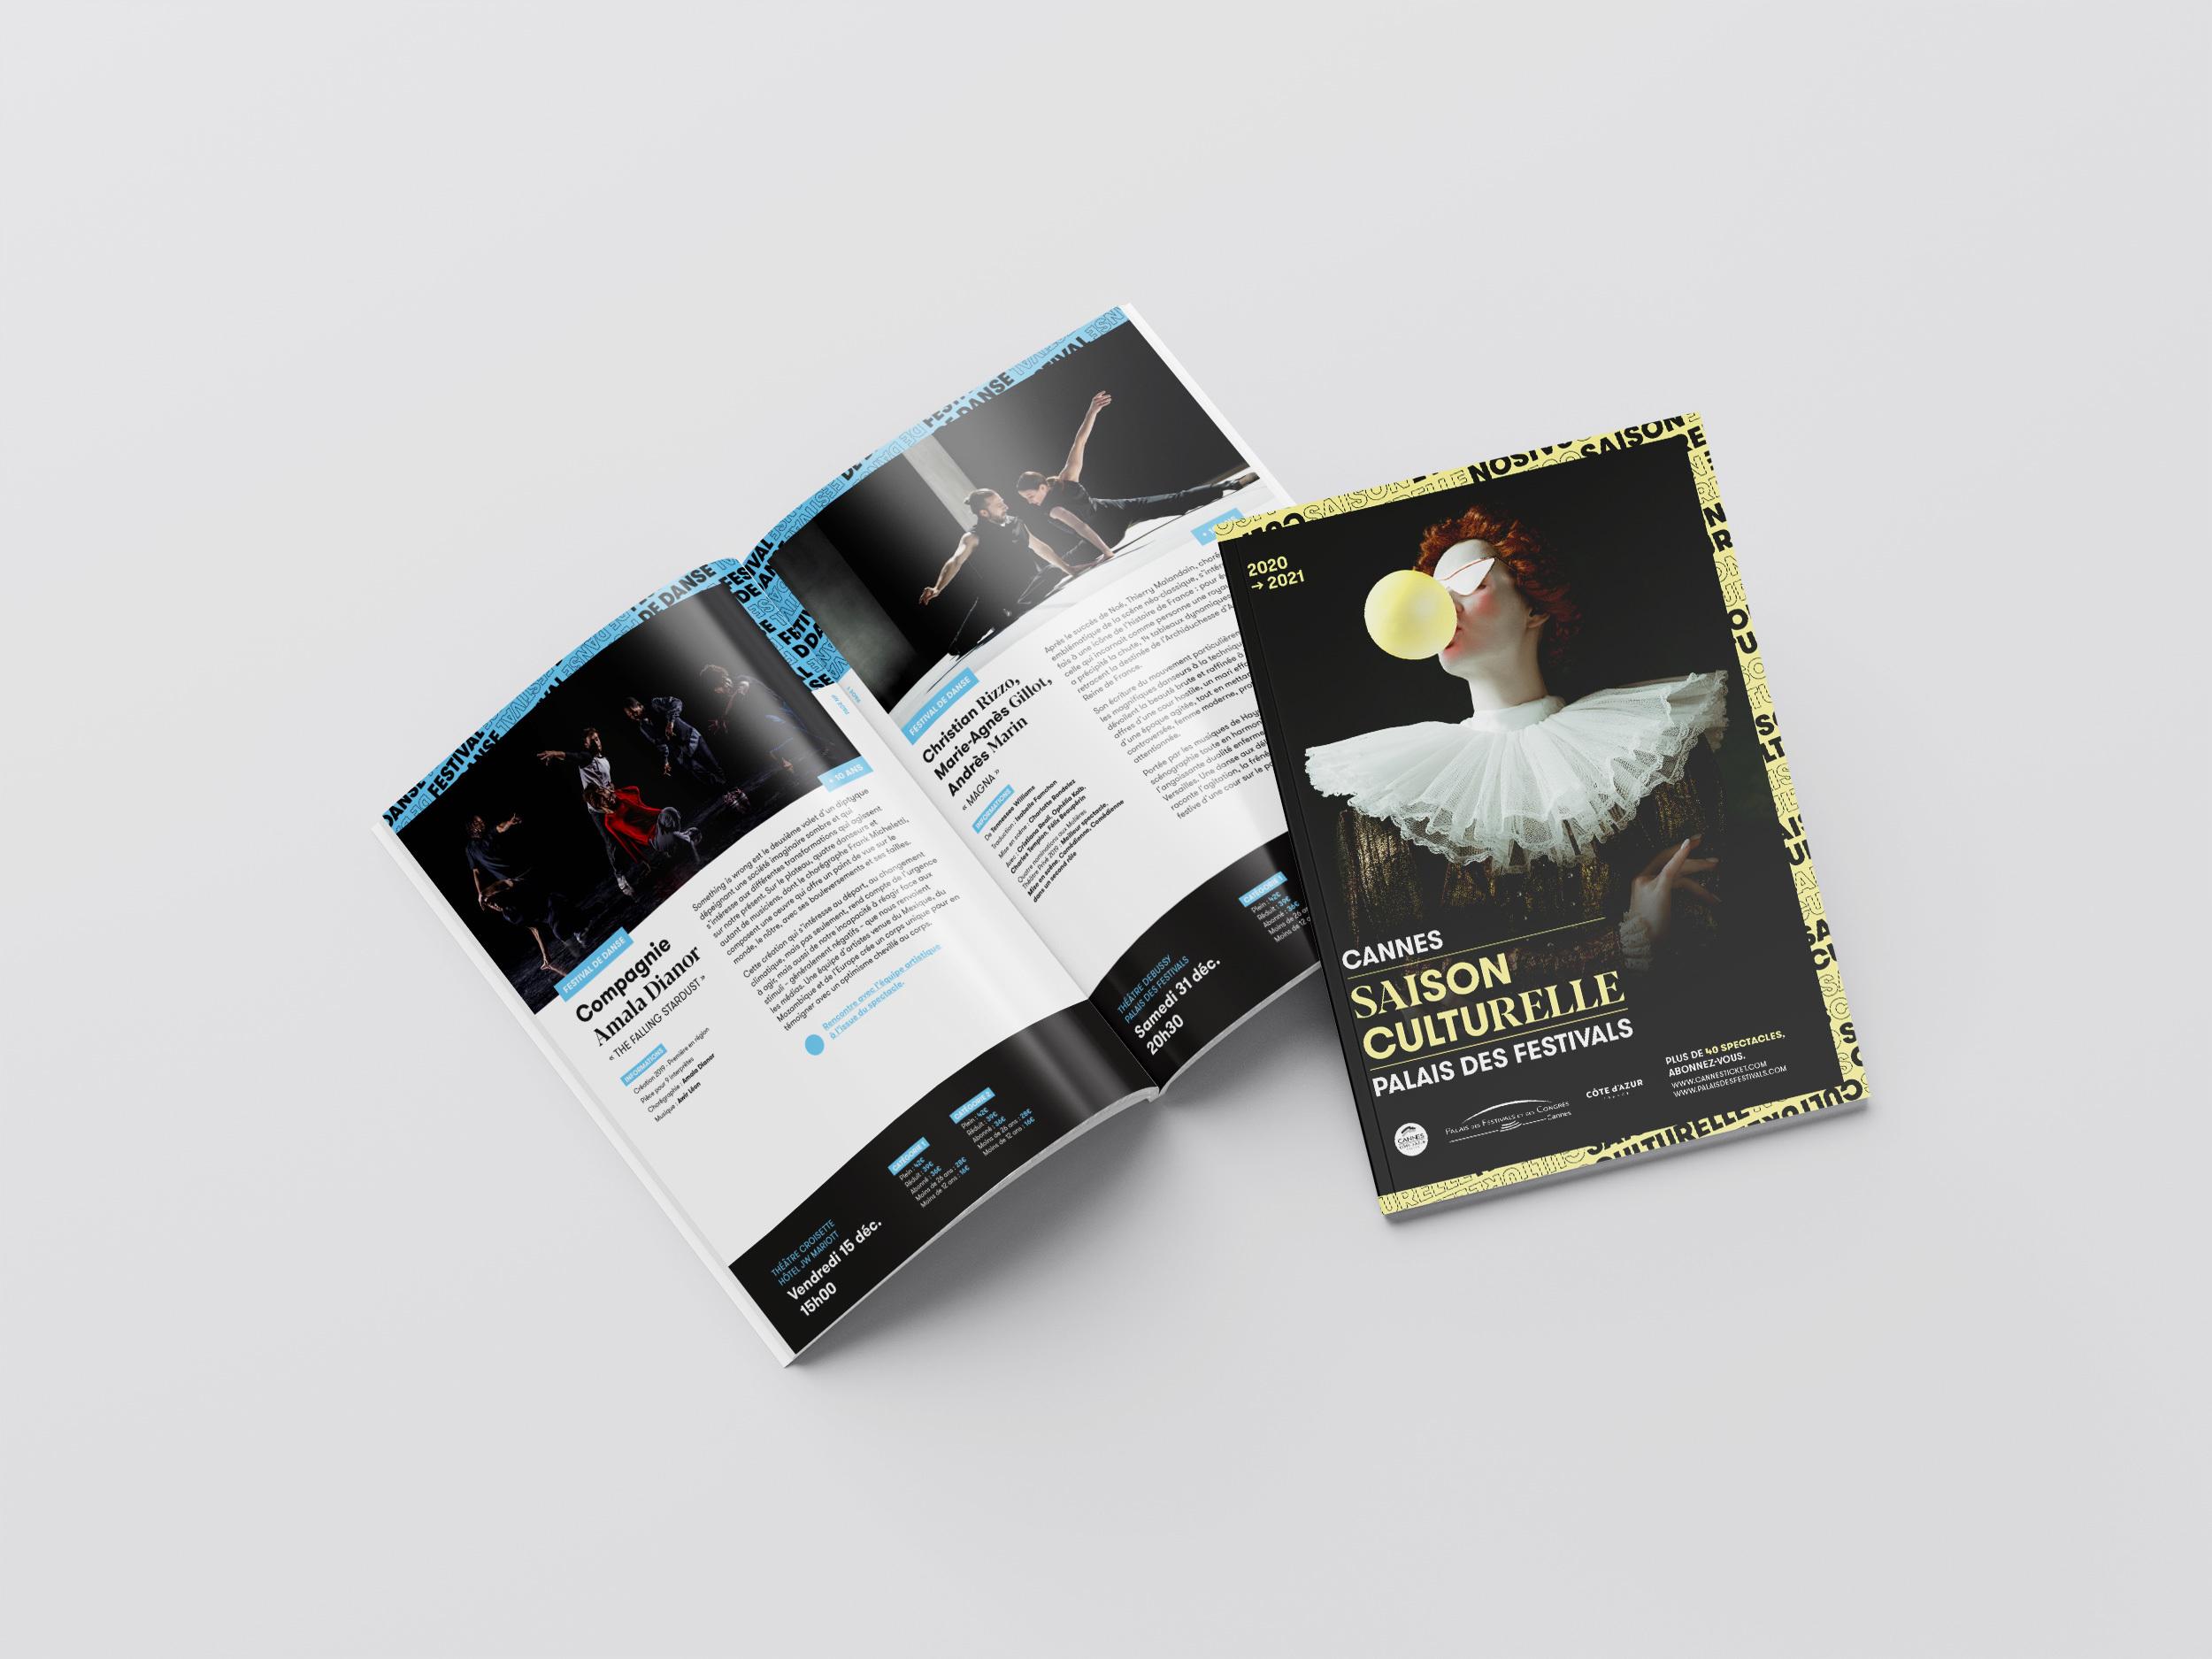 Palais Da Saison Culturelle Magazine 3